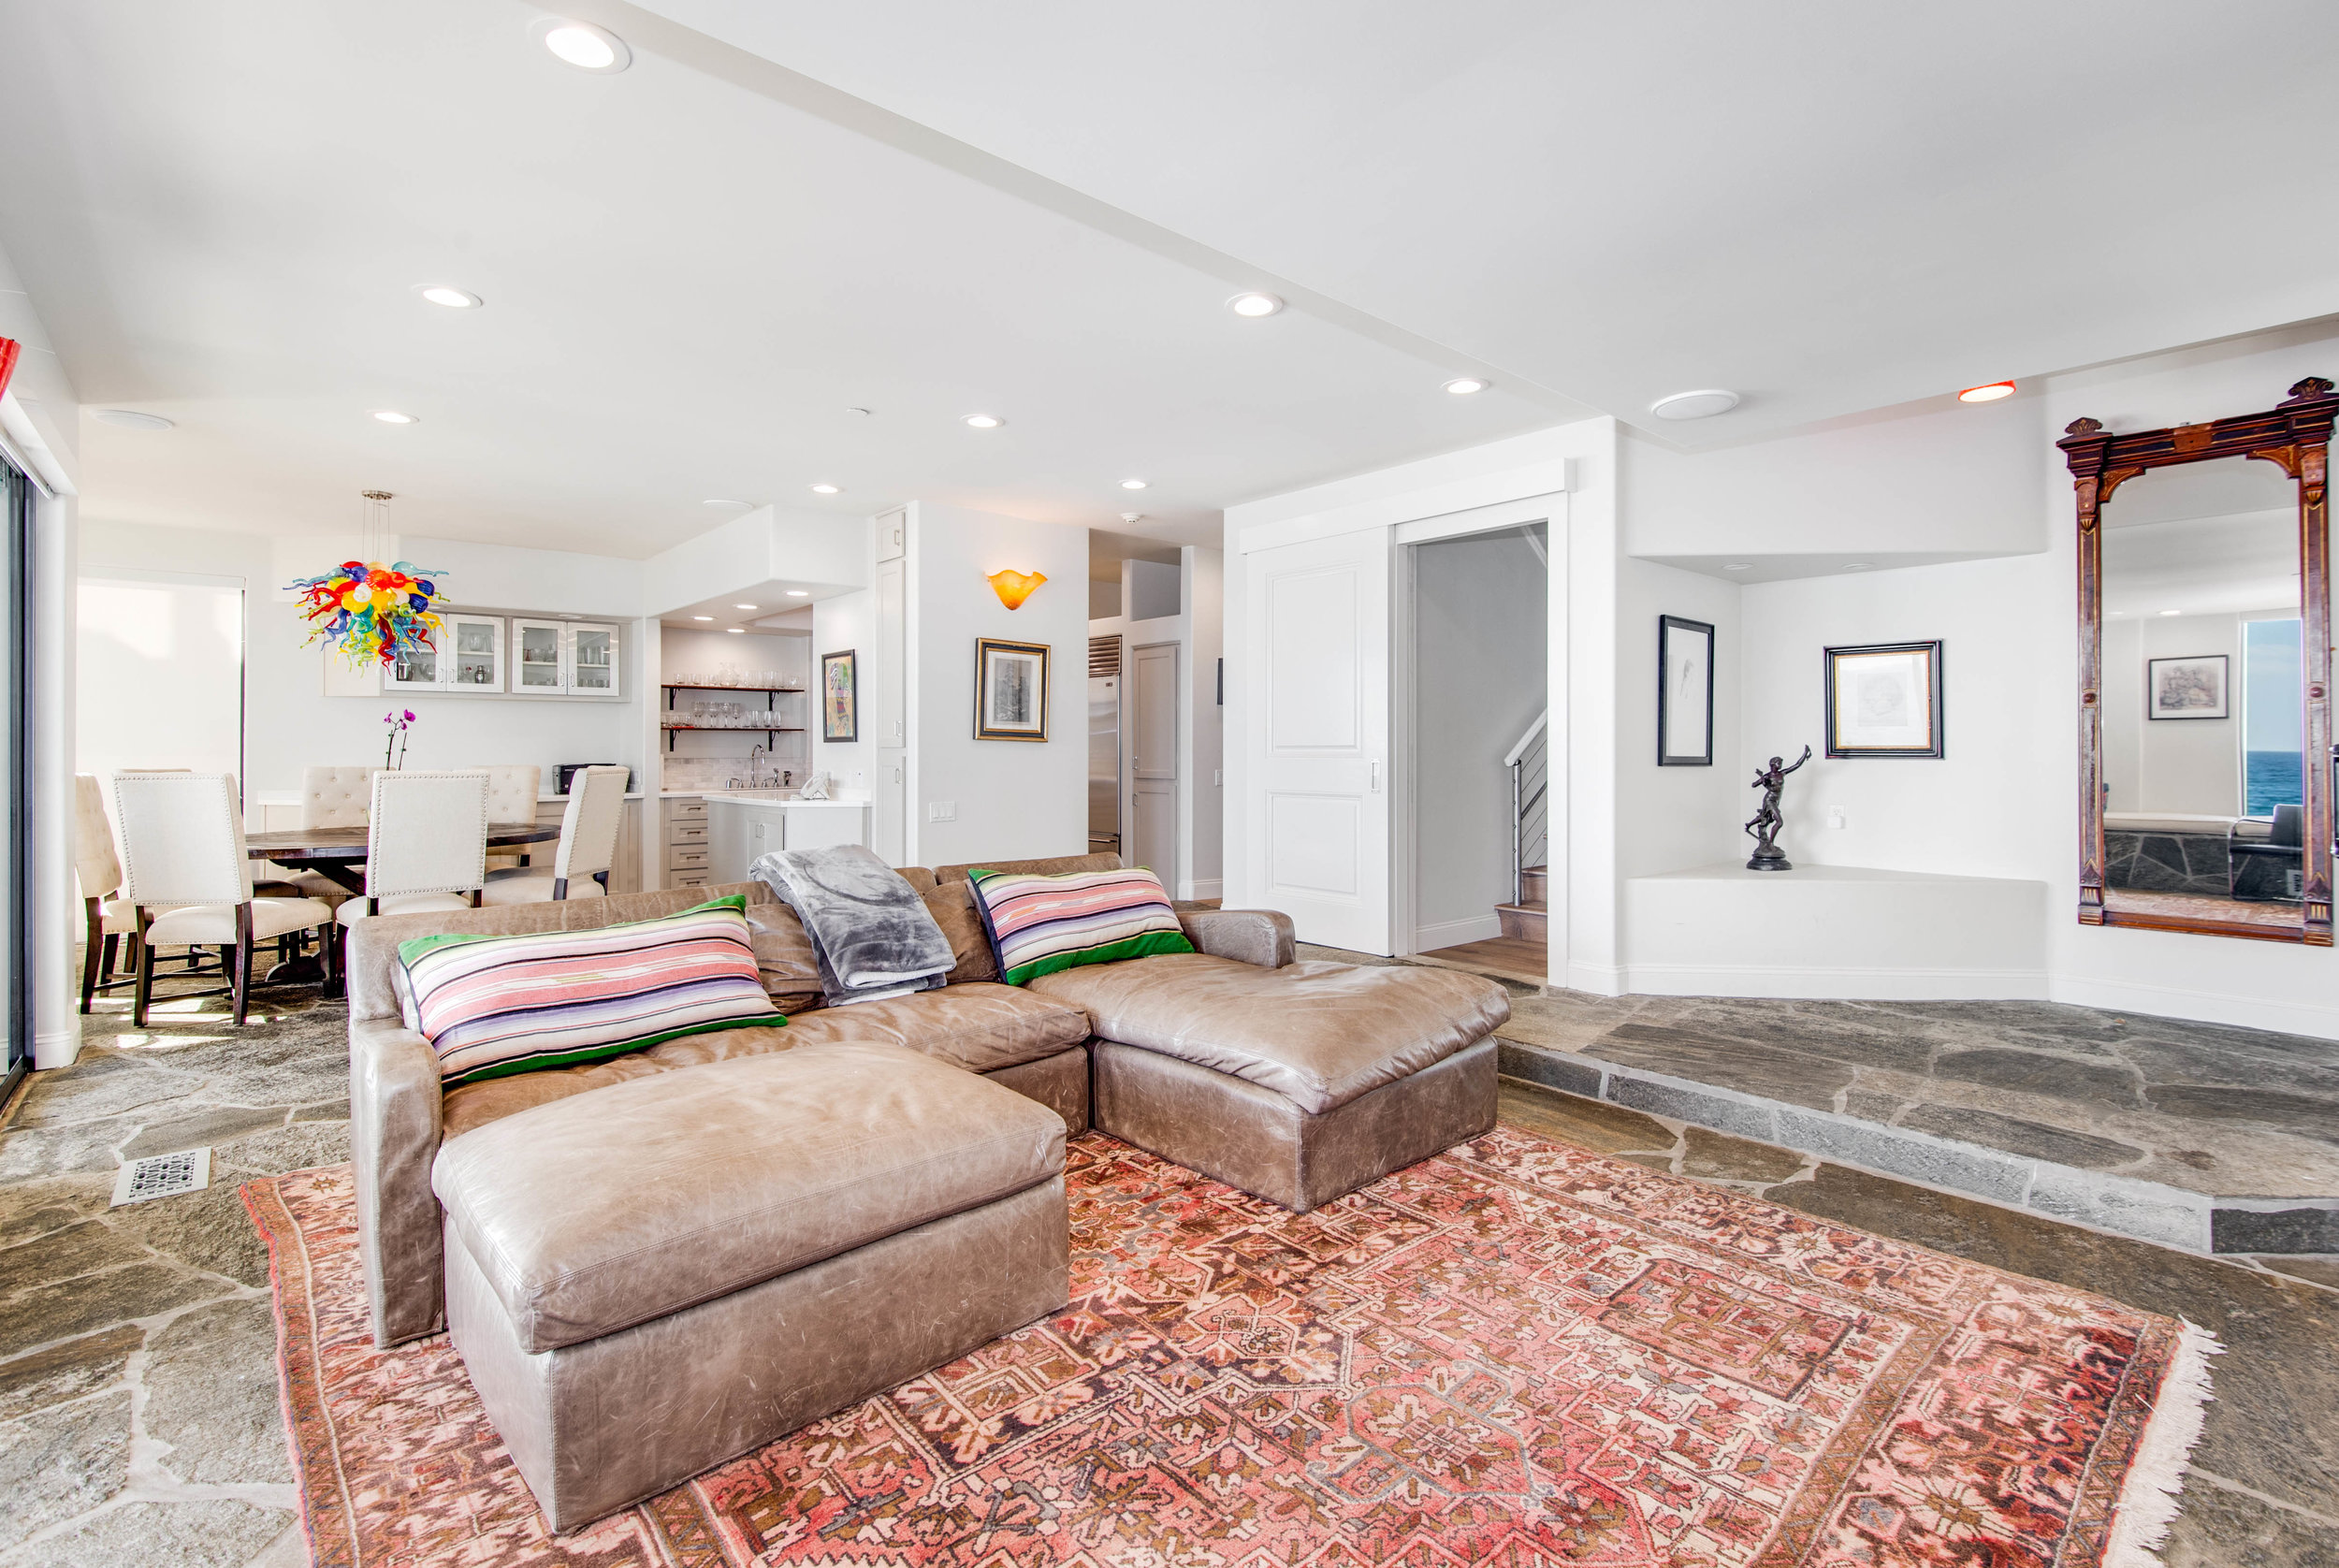 023 Living Room 25252 Malibu Road For Sale Lease The Malibu Life Team Luxury Real Estate.jpg